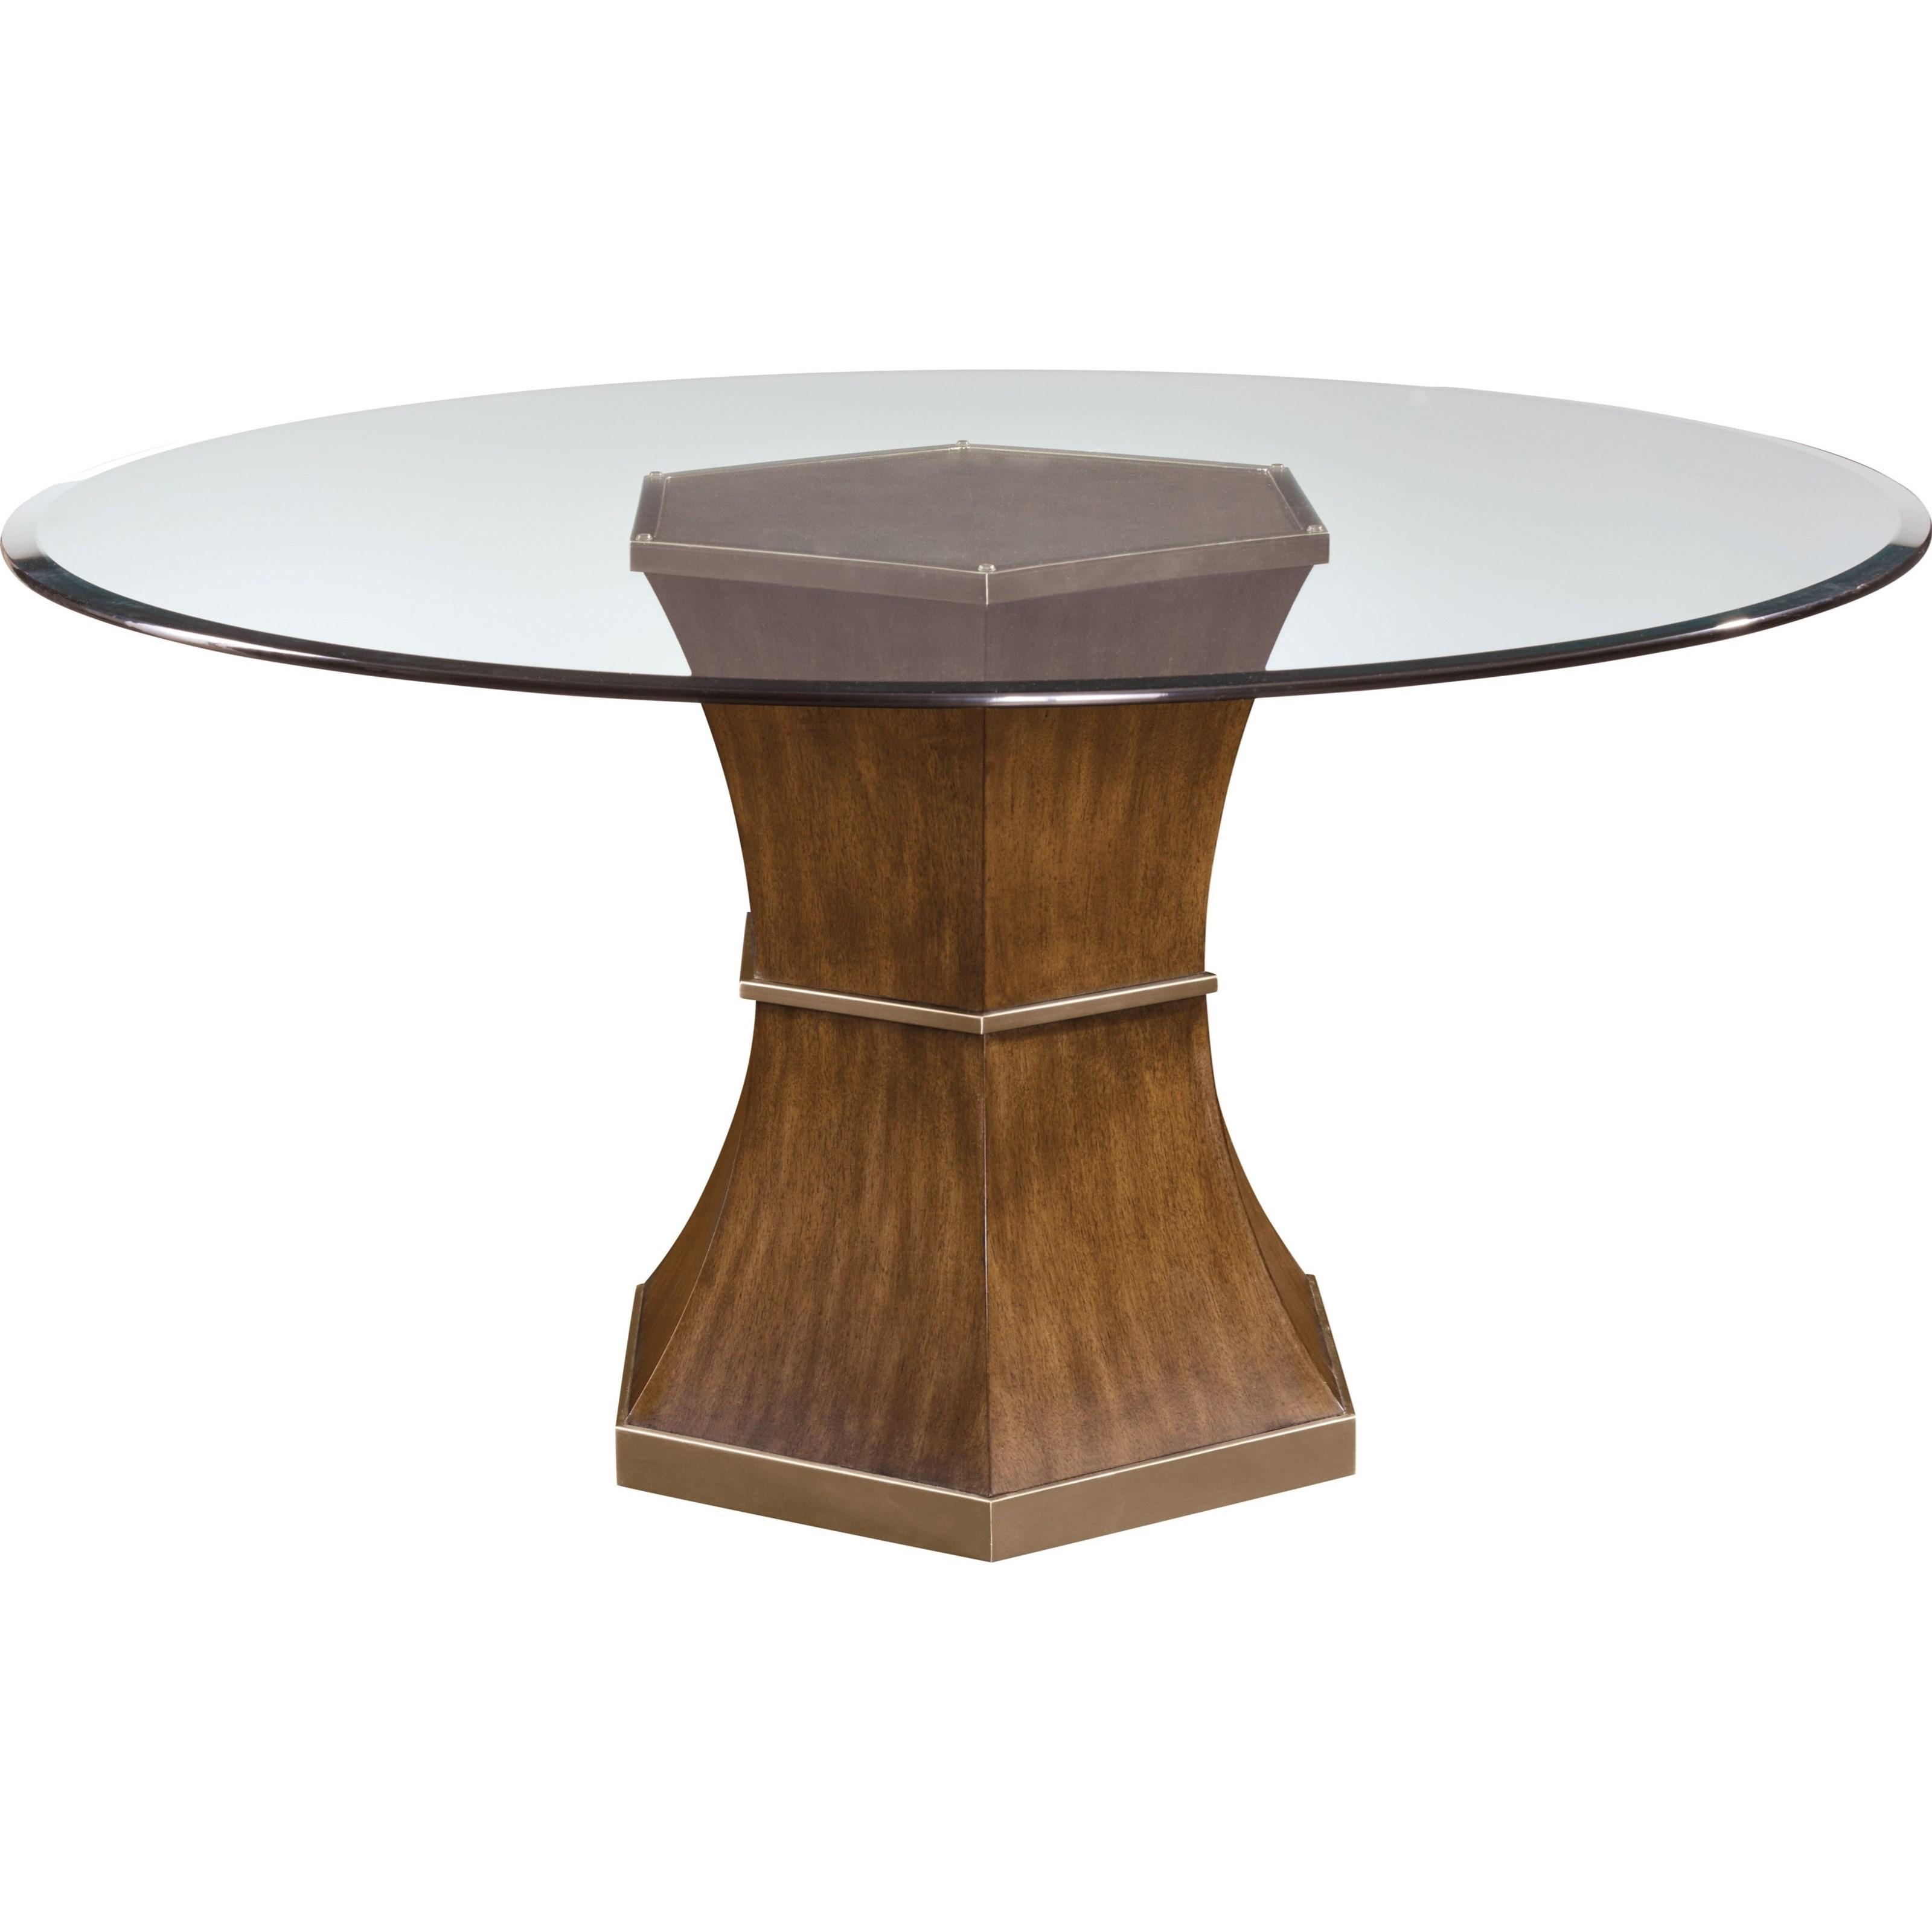 Thomasville® Retrospect Salome Table   Item Number: 85421 720+85421 726